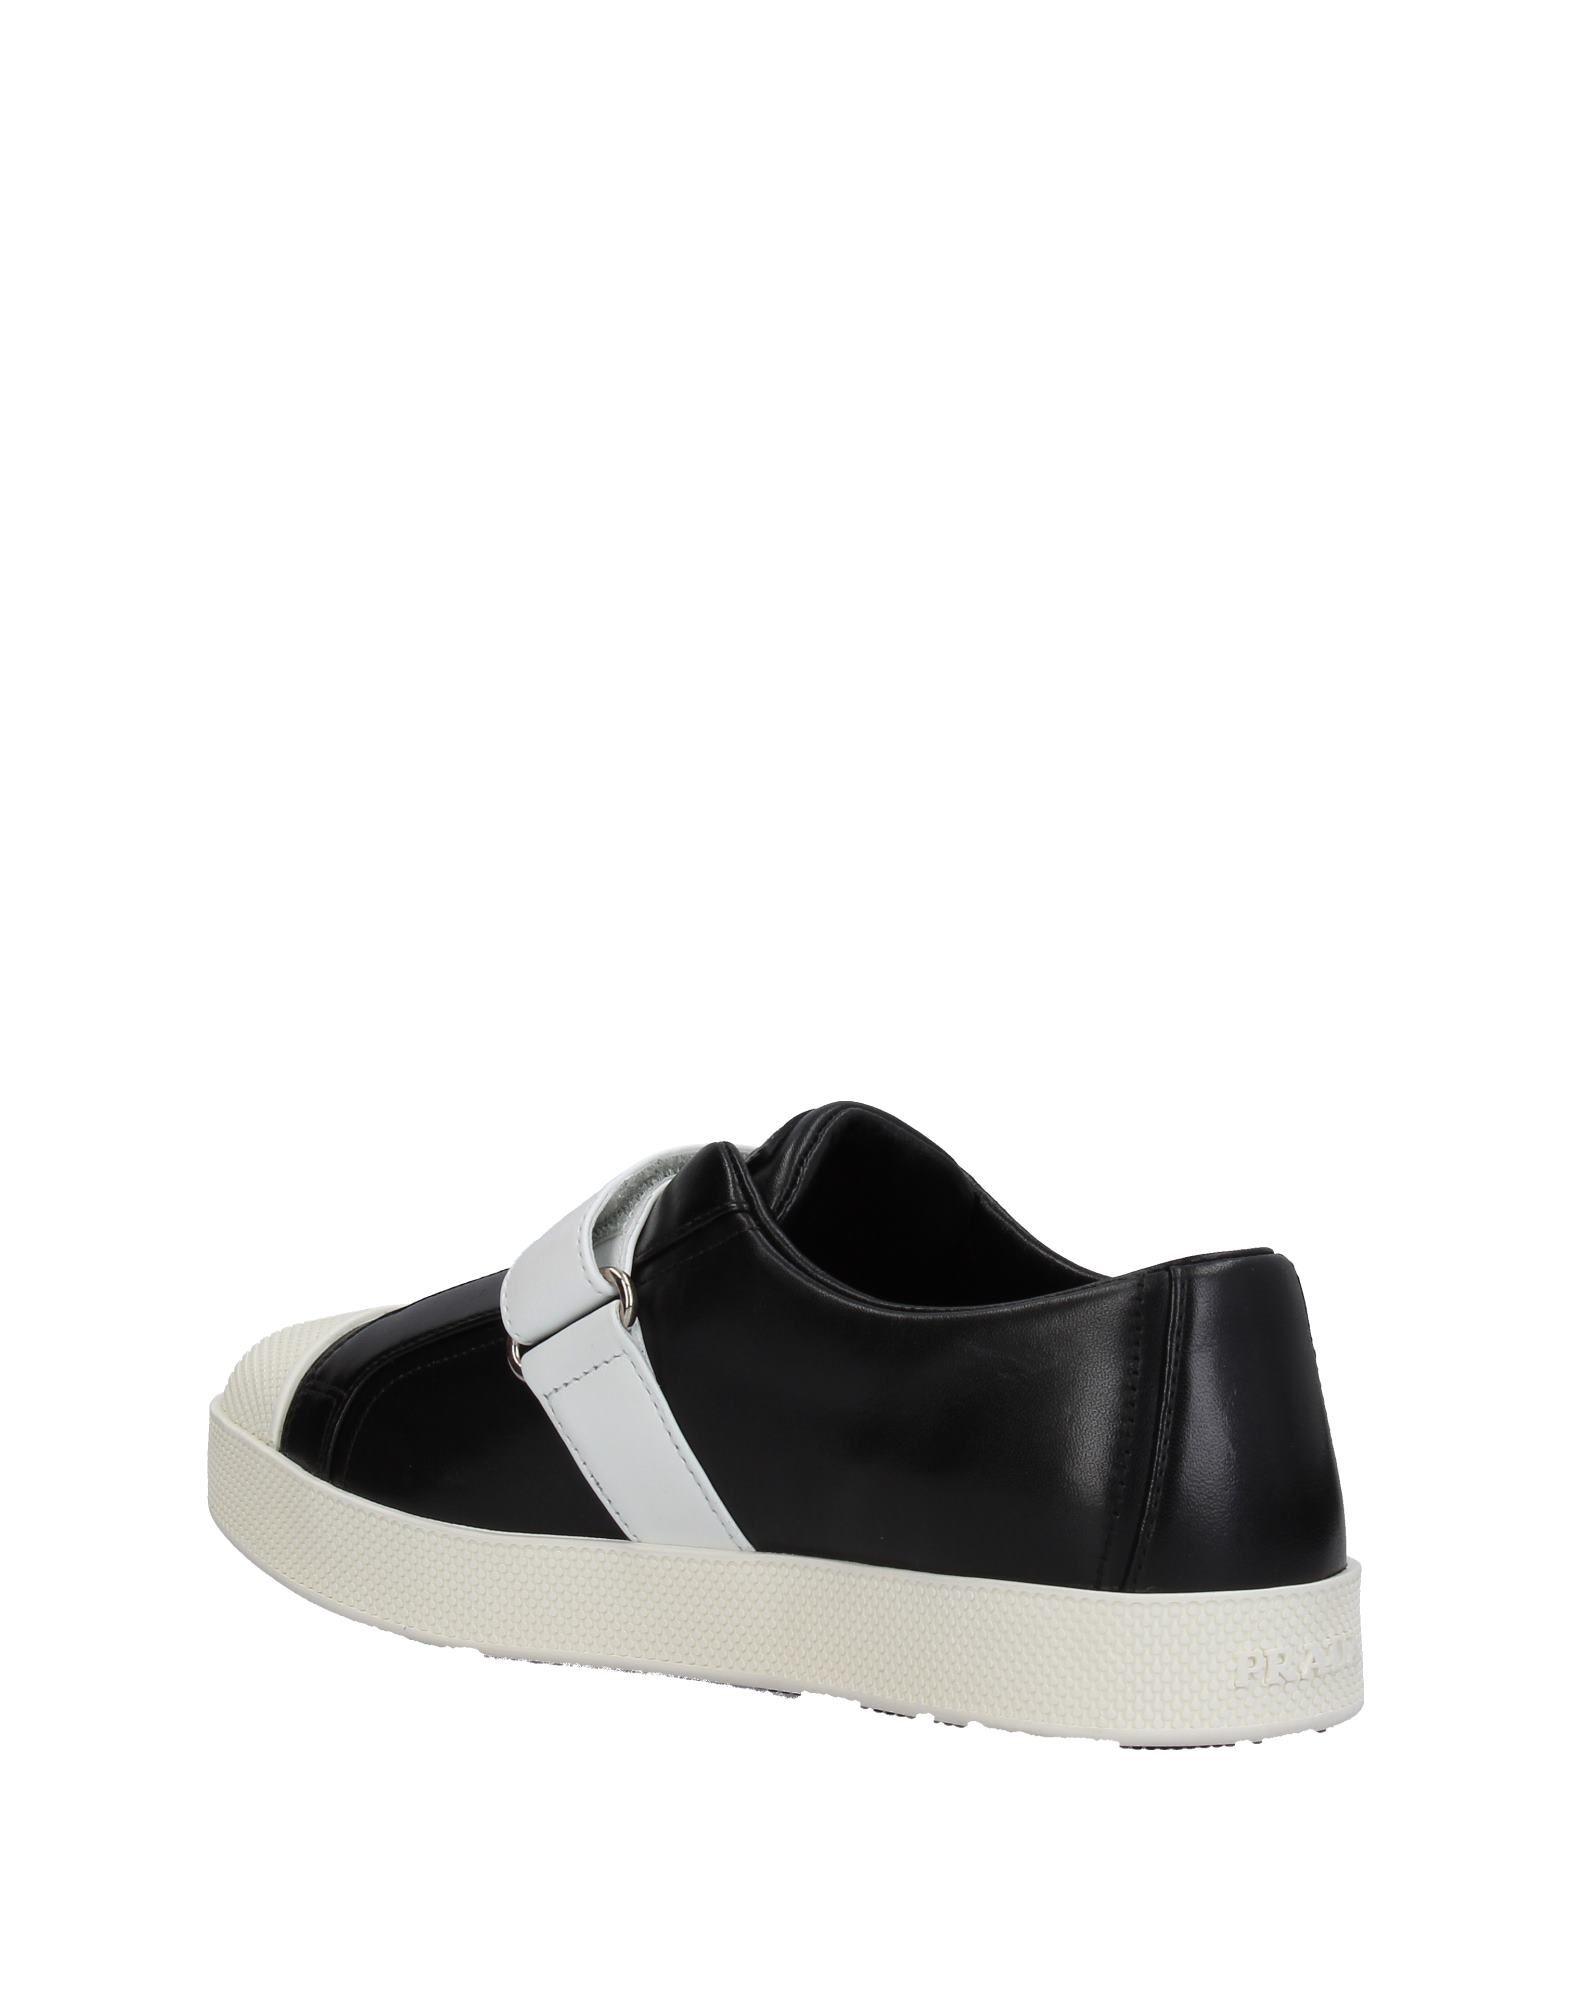 Rabatt Schuhe Prada Sport Sneakers Damen Damen Sneakers  11357843EL 8f479a